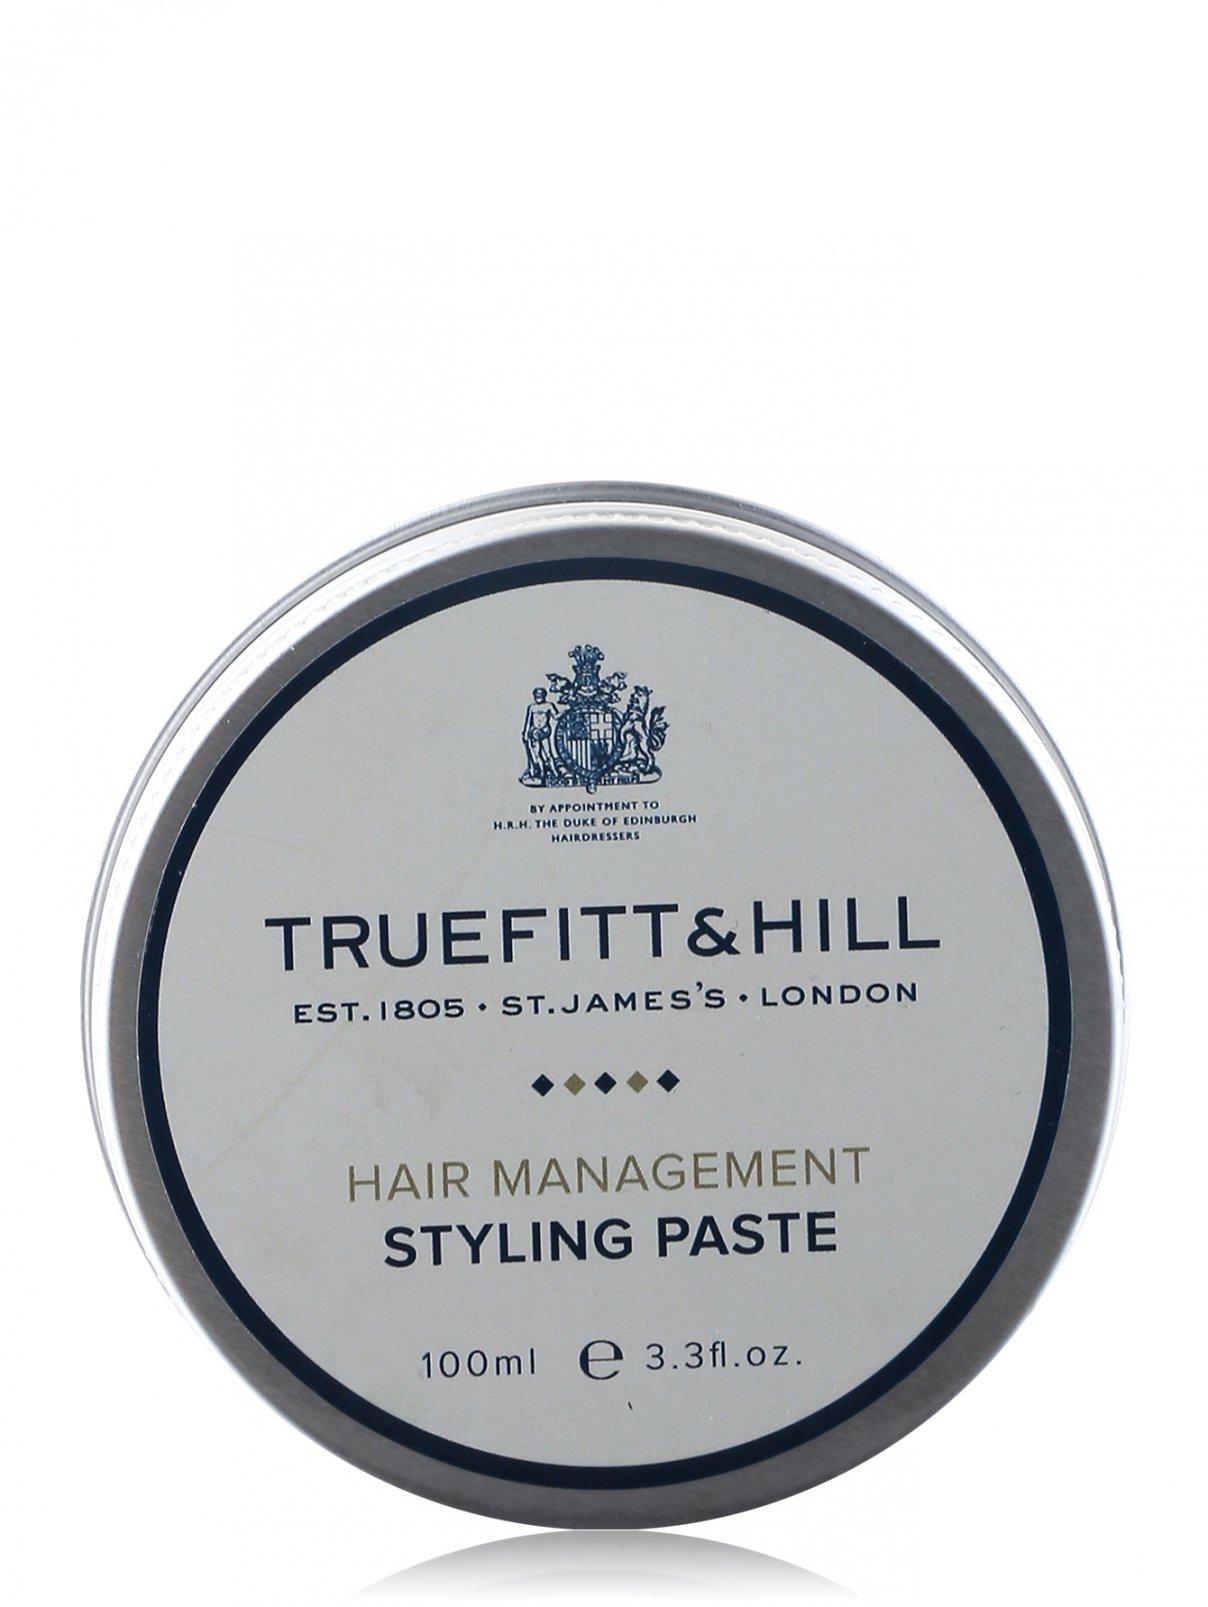 Паста для укладки волос  - Styling paste, 100ml Truefitt & Hill  –  Общий вид